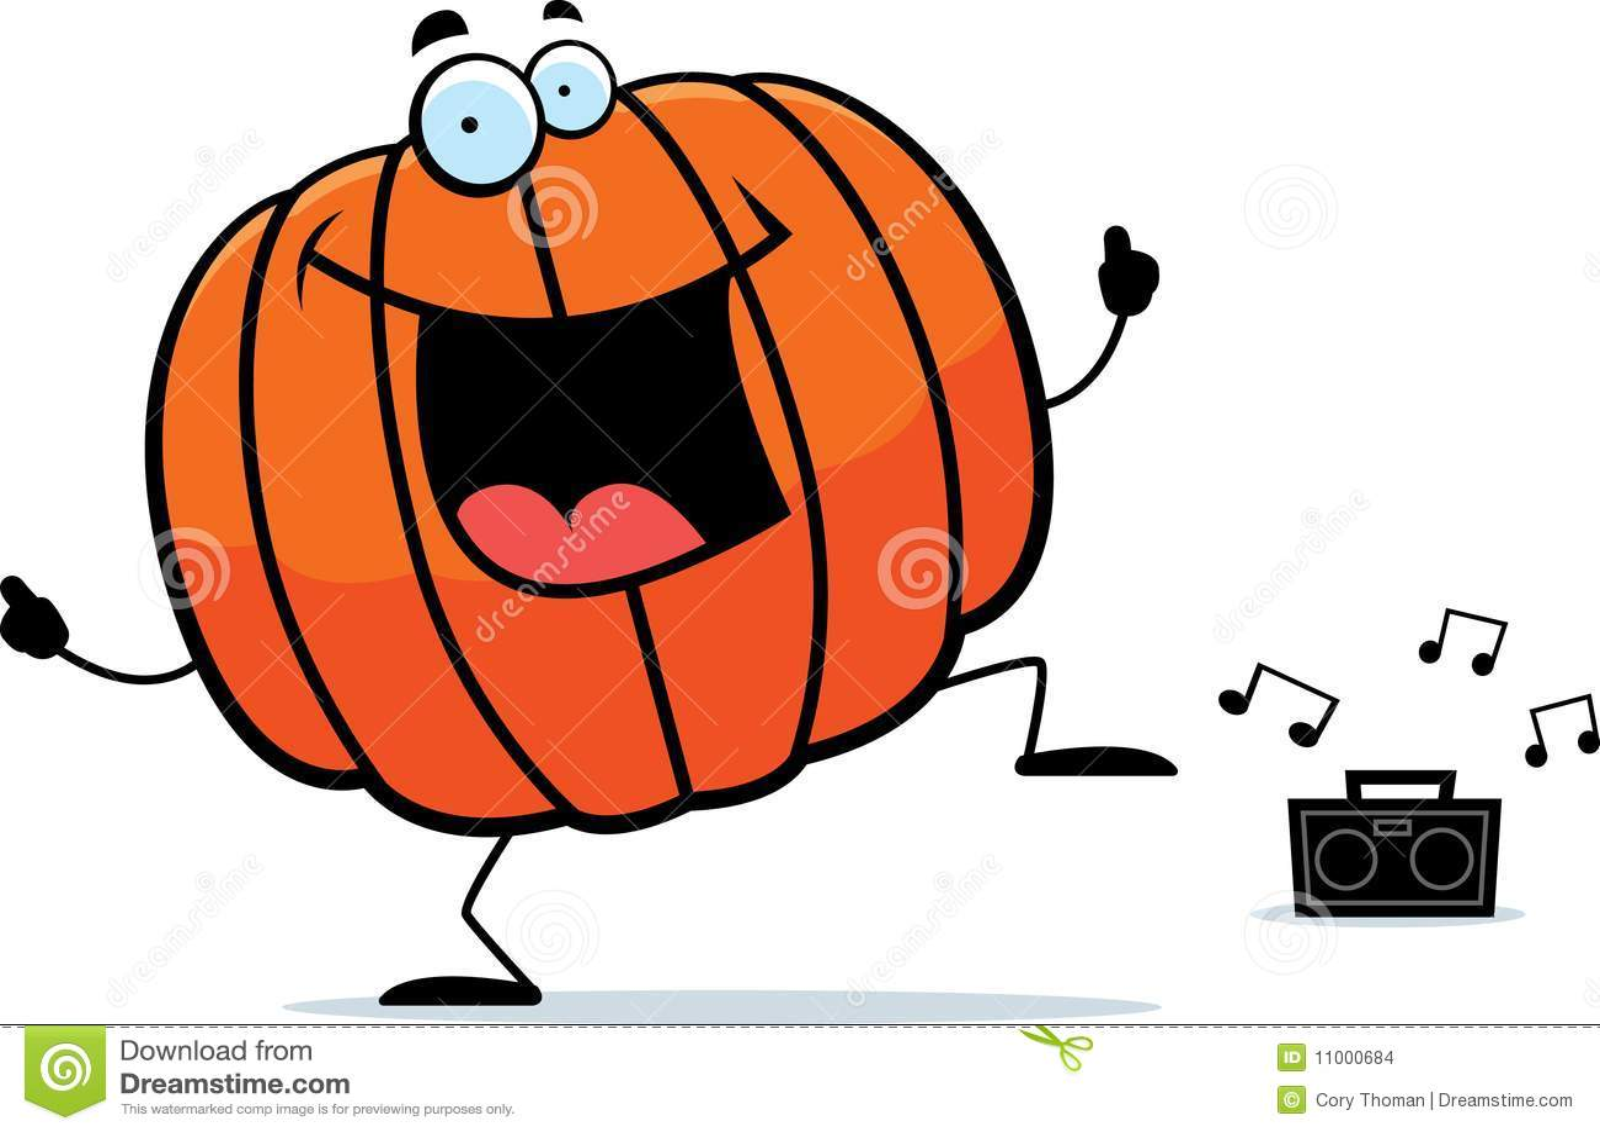 pumpkin dancing stock images image 11000684 dance vector black and white dance vector black and white